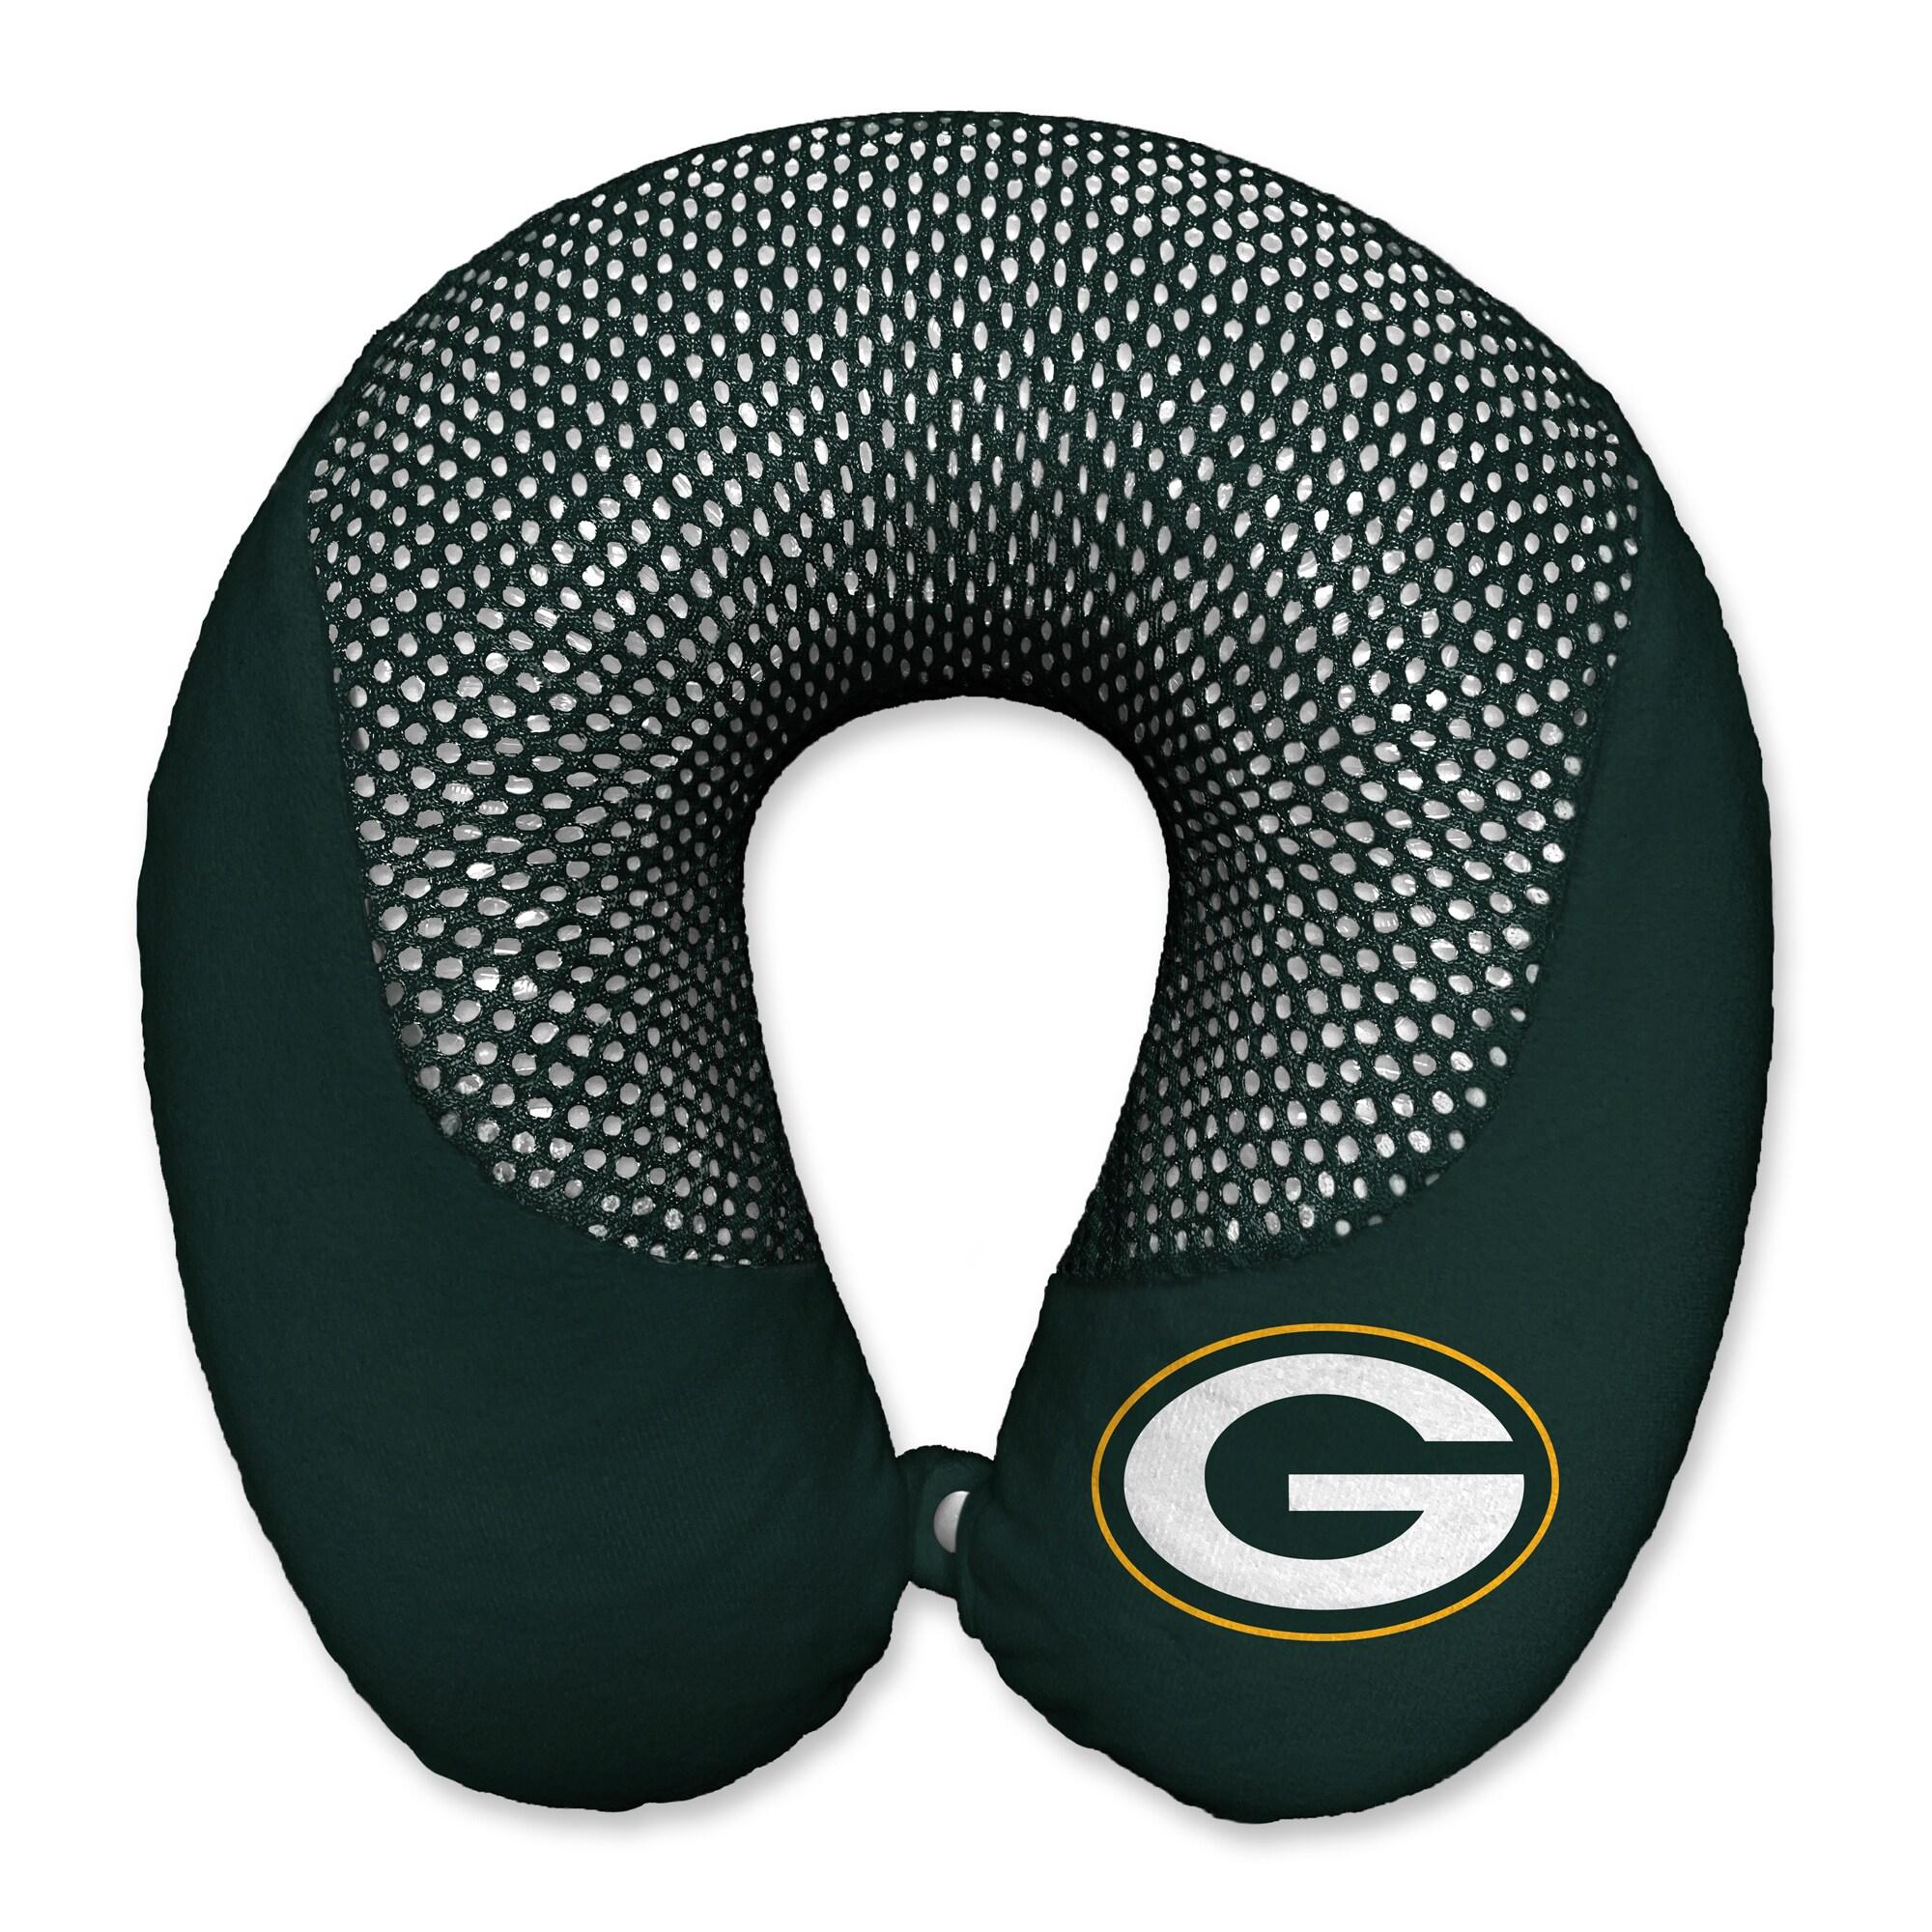 Green Bay Packers Cooling Gel Plush Memory Foam Travel Pillow - Green